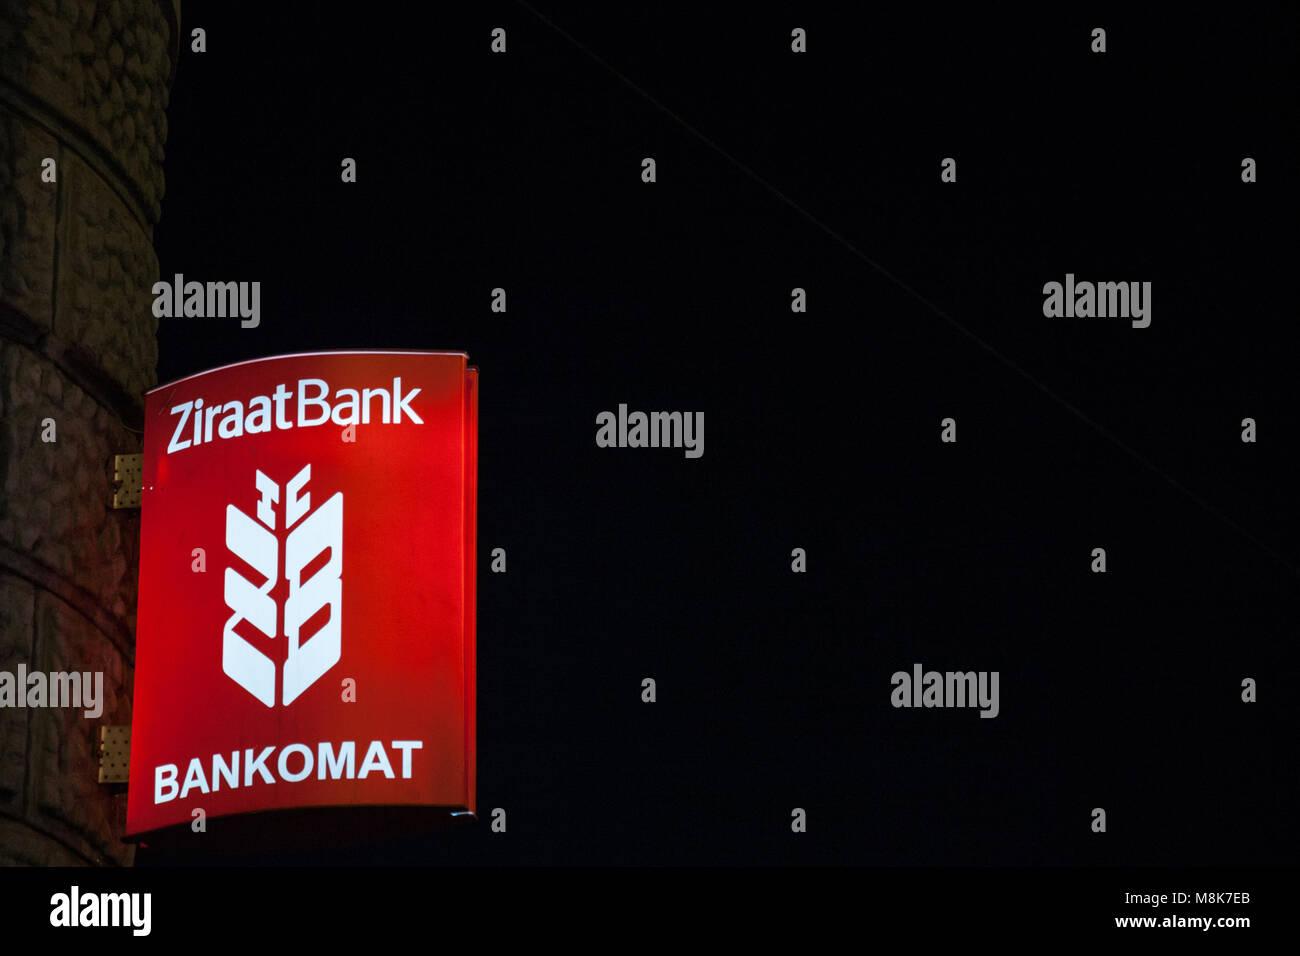 SARAJEVO, BOSNIA - FEBRUARY 16, 2018: Turkish Ziraat Bank logo on their main bank in Sarajevo, taken at night. Ziraat - Stock Image